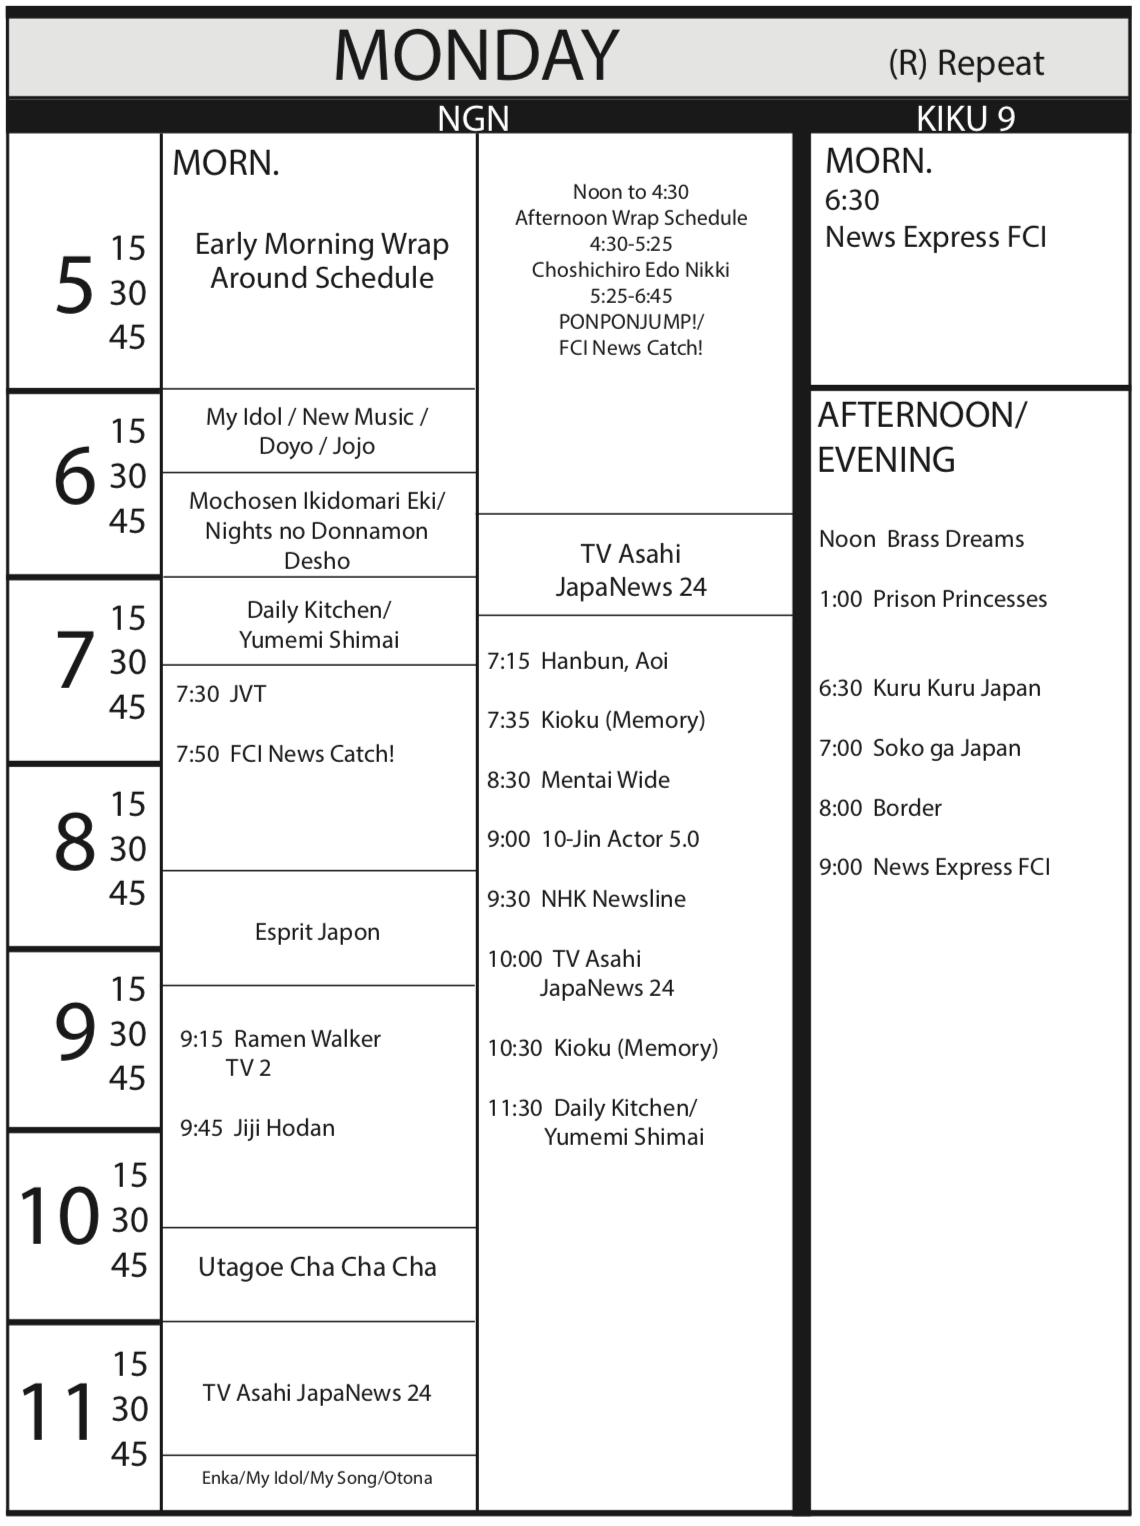 TV Program Schedule June 15, 2018 Issue - Monday